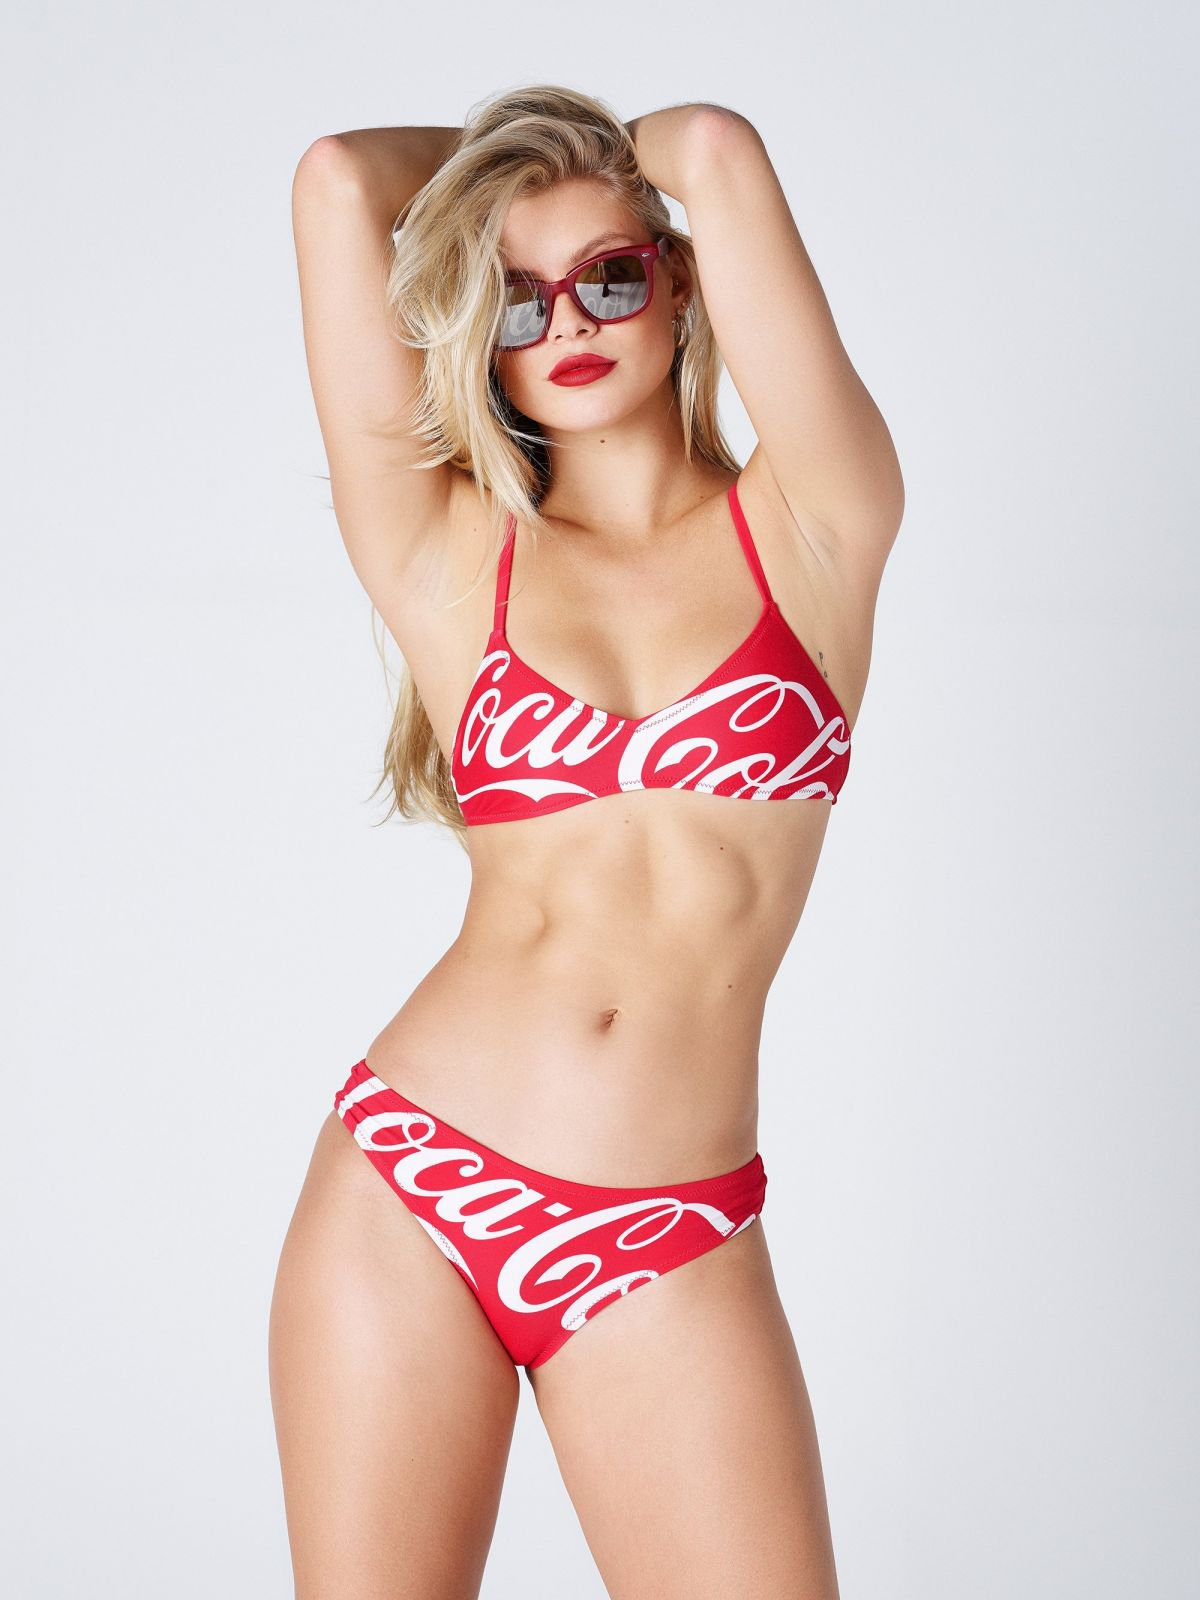 Josie Canseco Hot Bikini Photoshoot